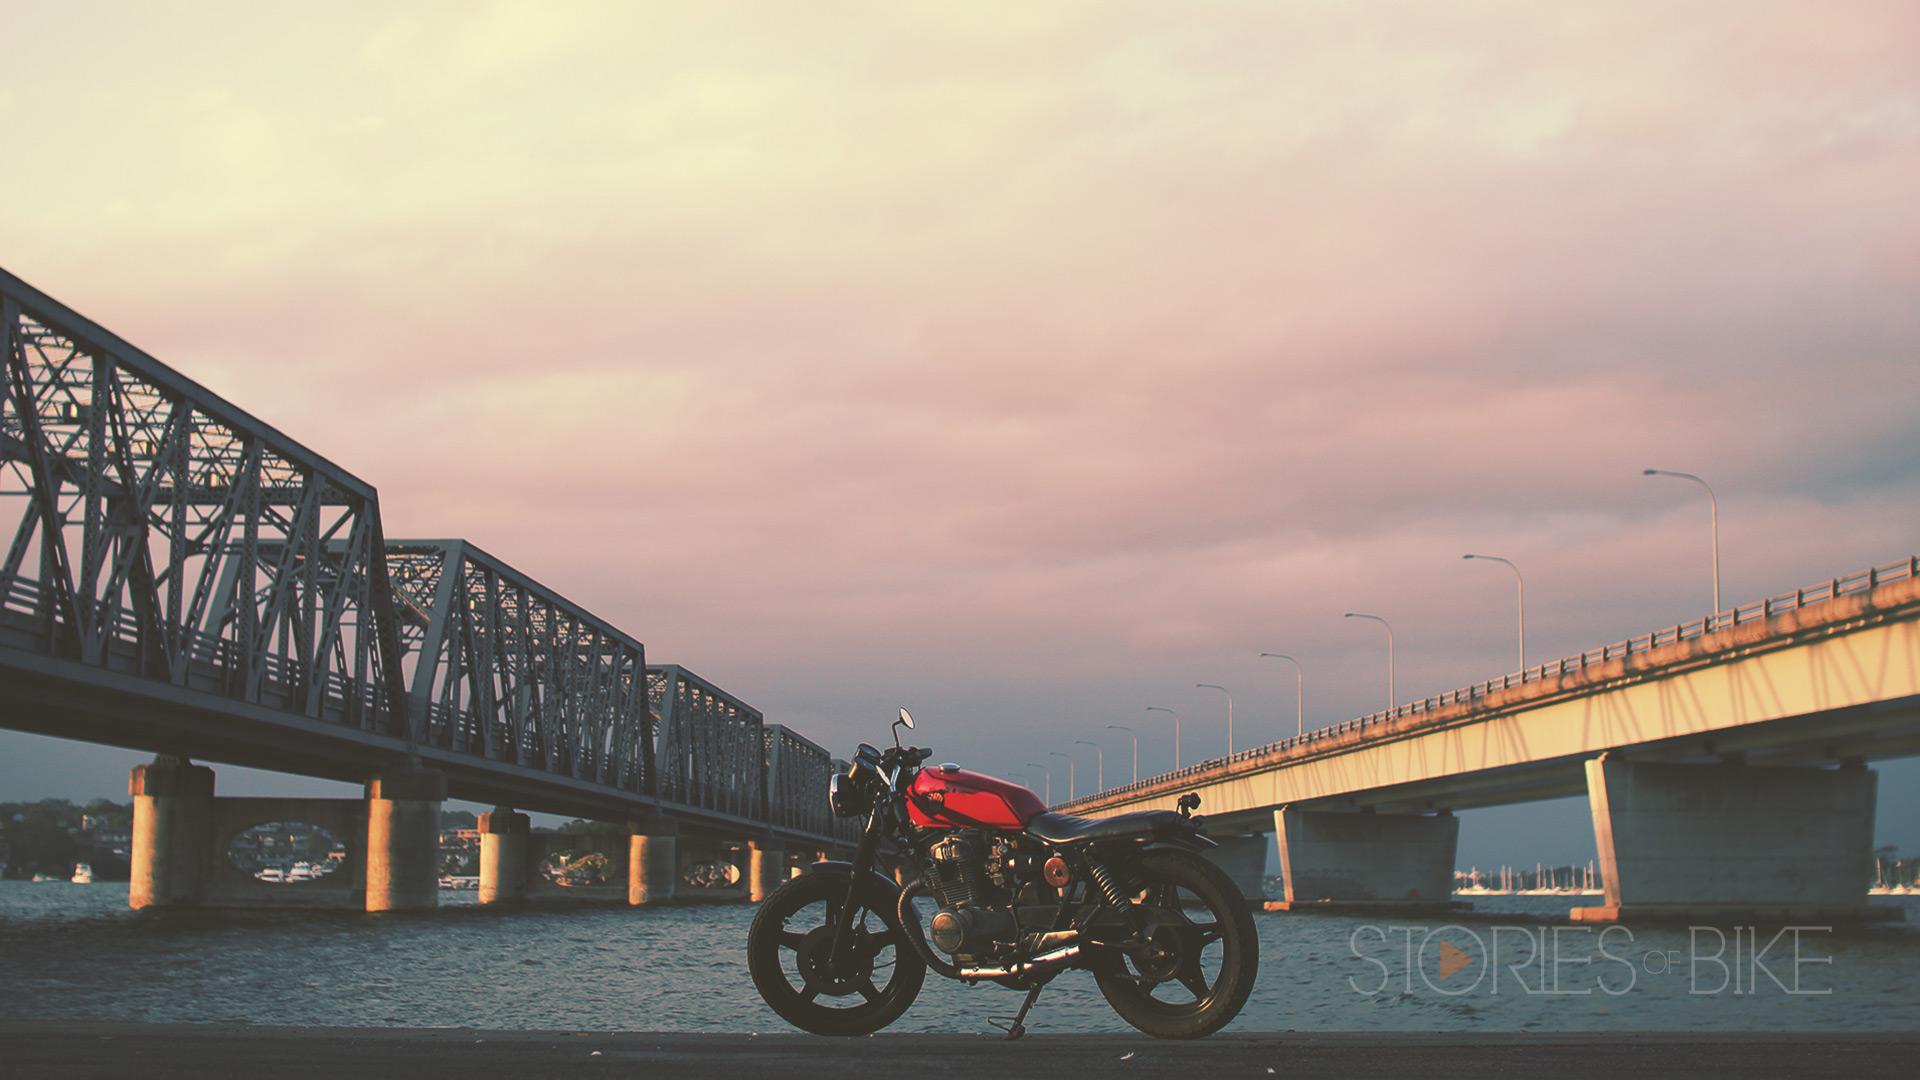 StoriesOfBike_Ep2_Bike_4.jpg